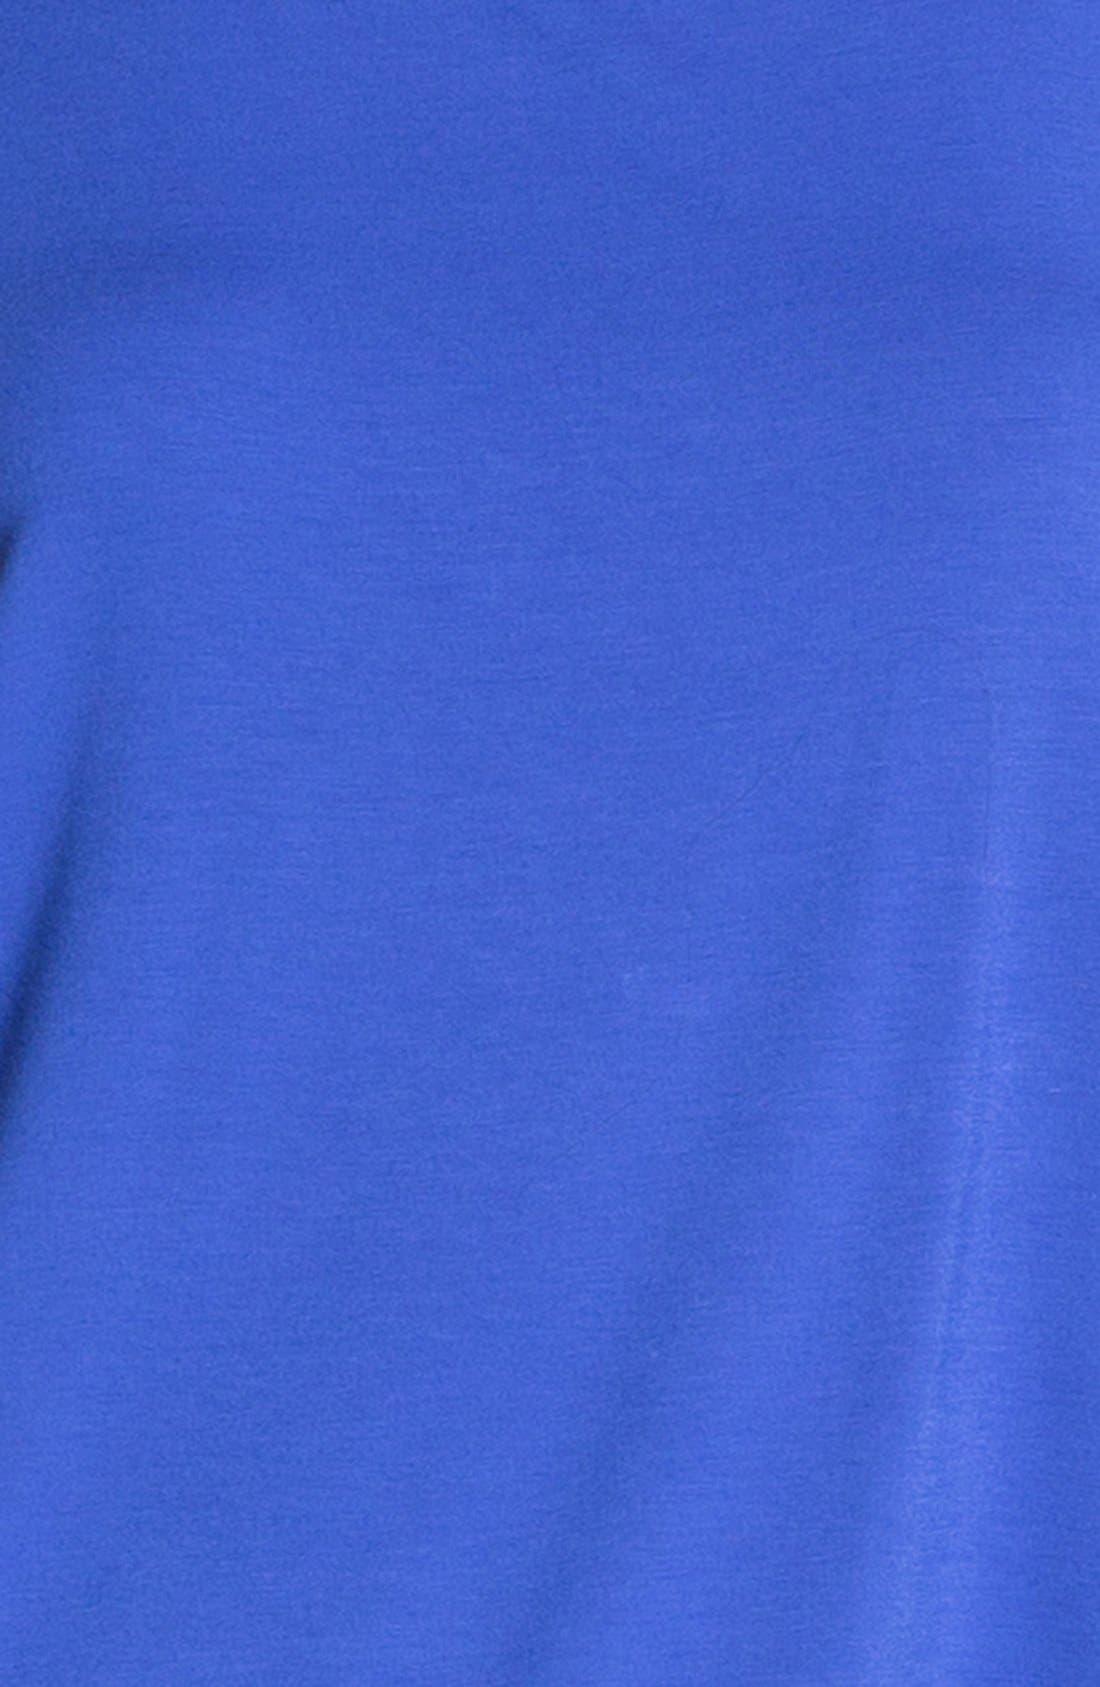 Alternate Image 3  - Kenneth Cole New York 'Marcela' Colorblock Blouse